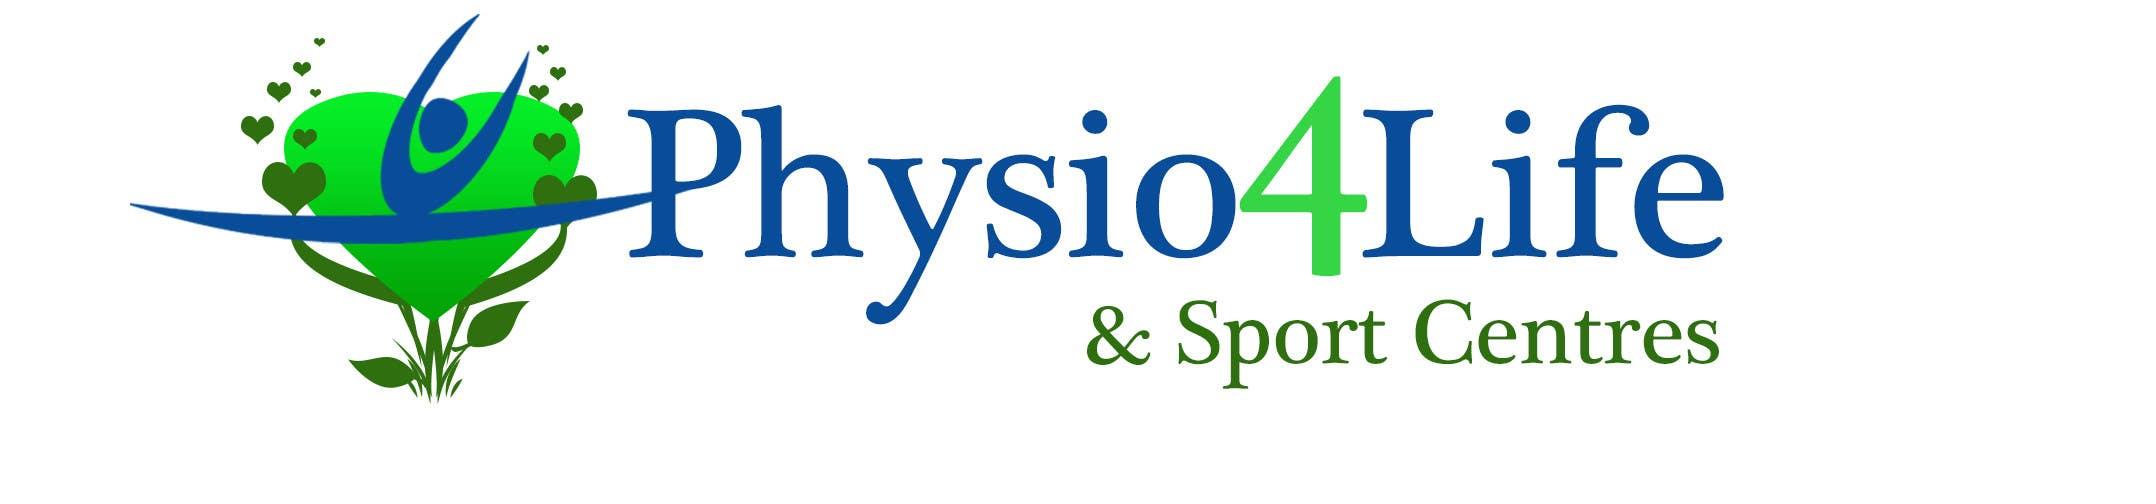 Konkurrenceindlæg #                                        23                                      for                                         Design a Logo for physio company